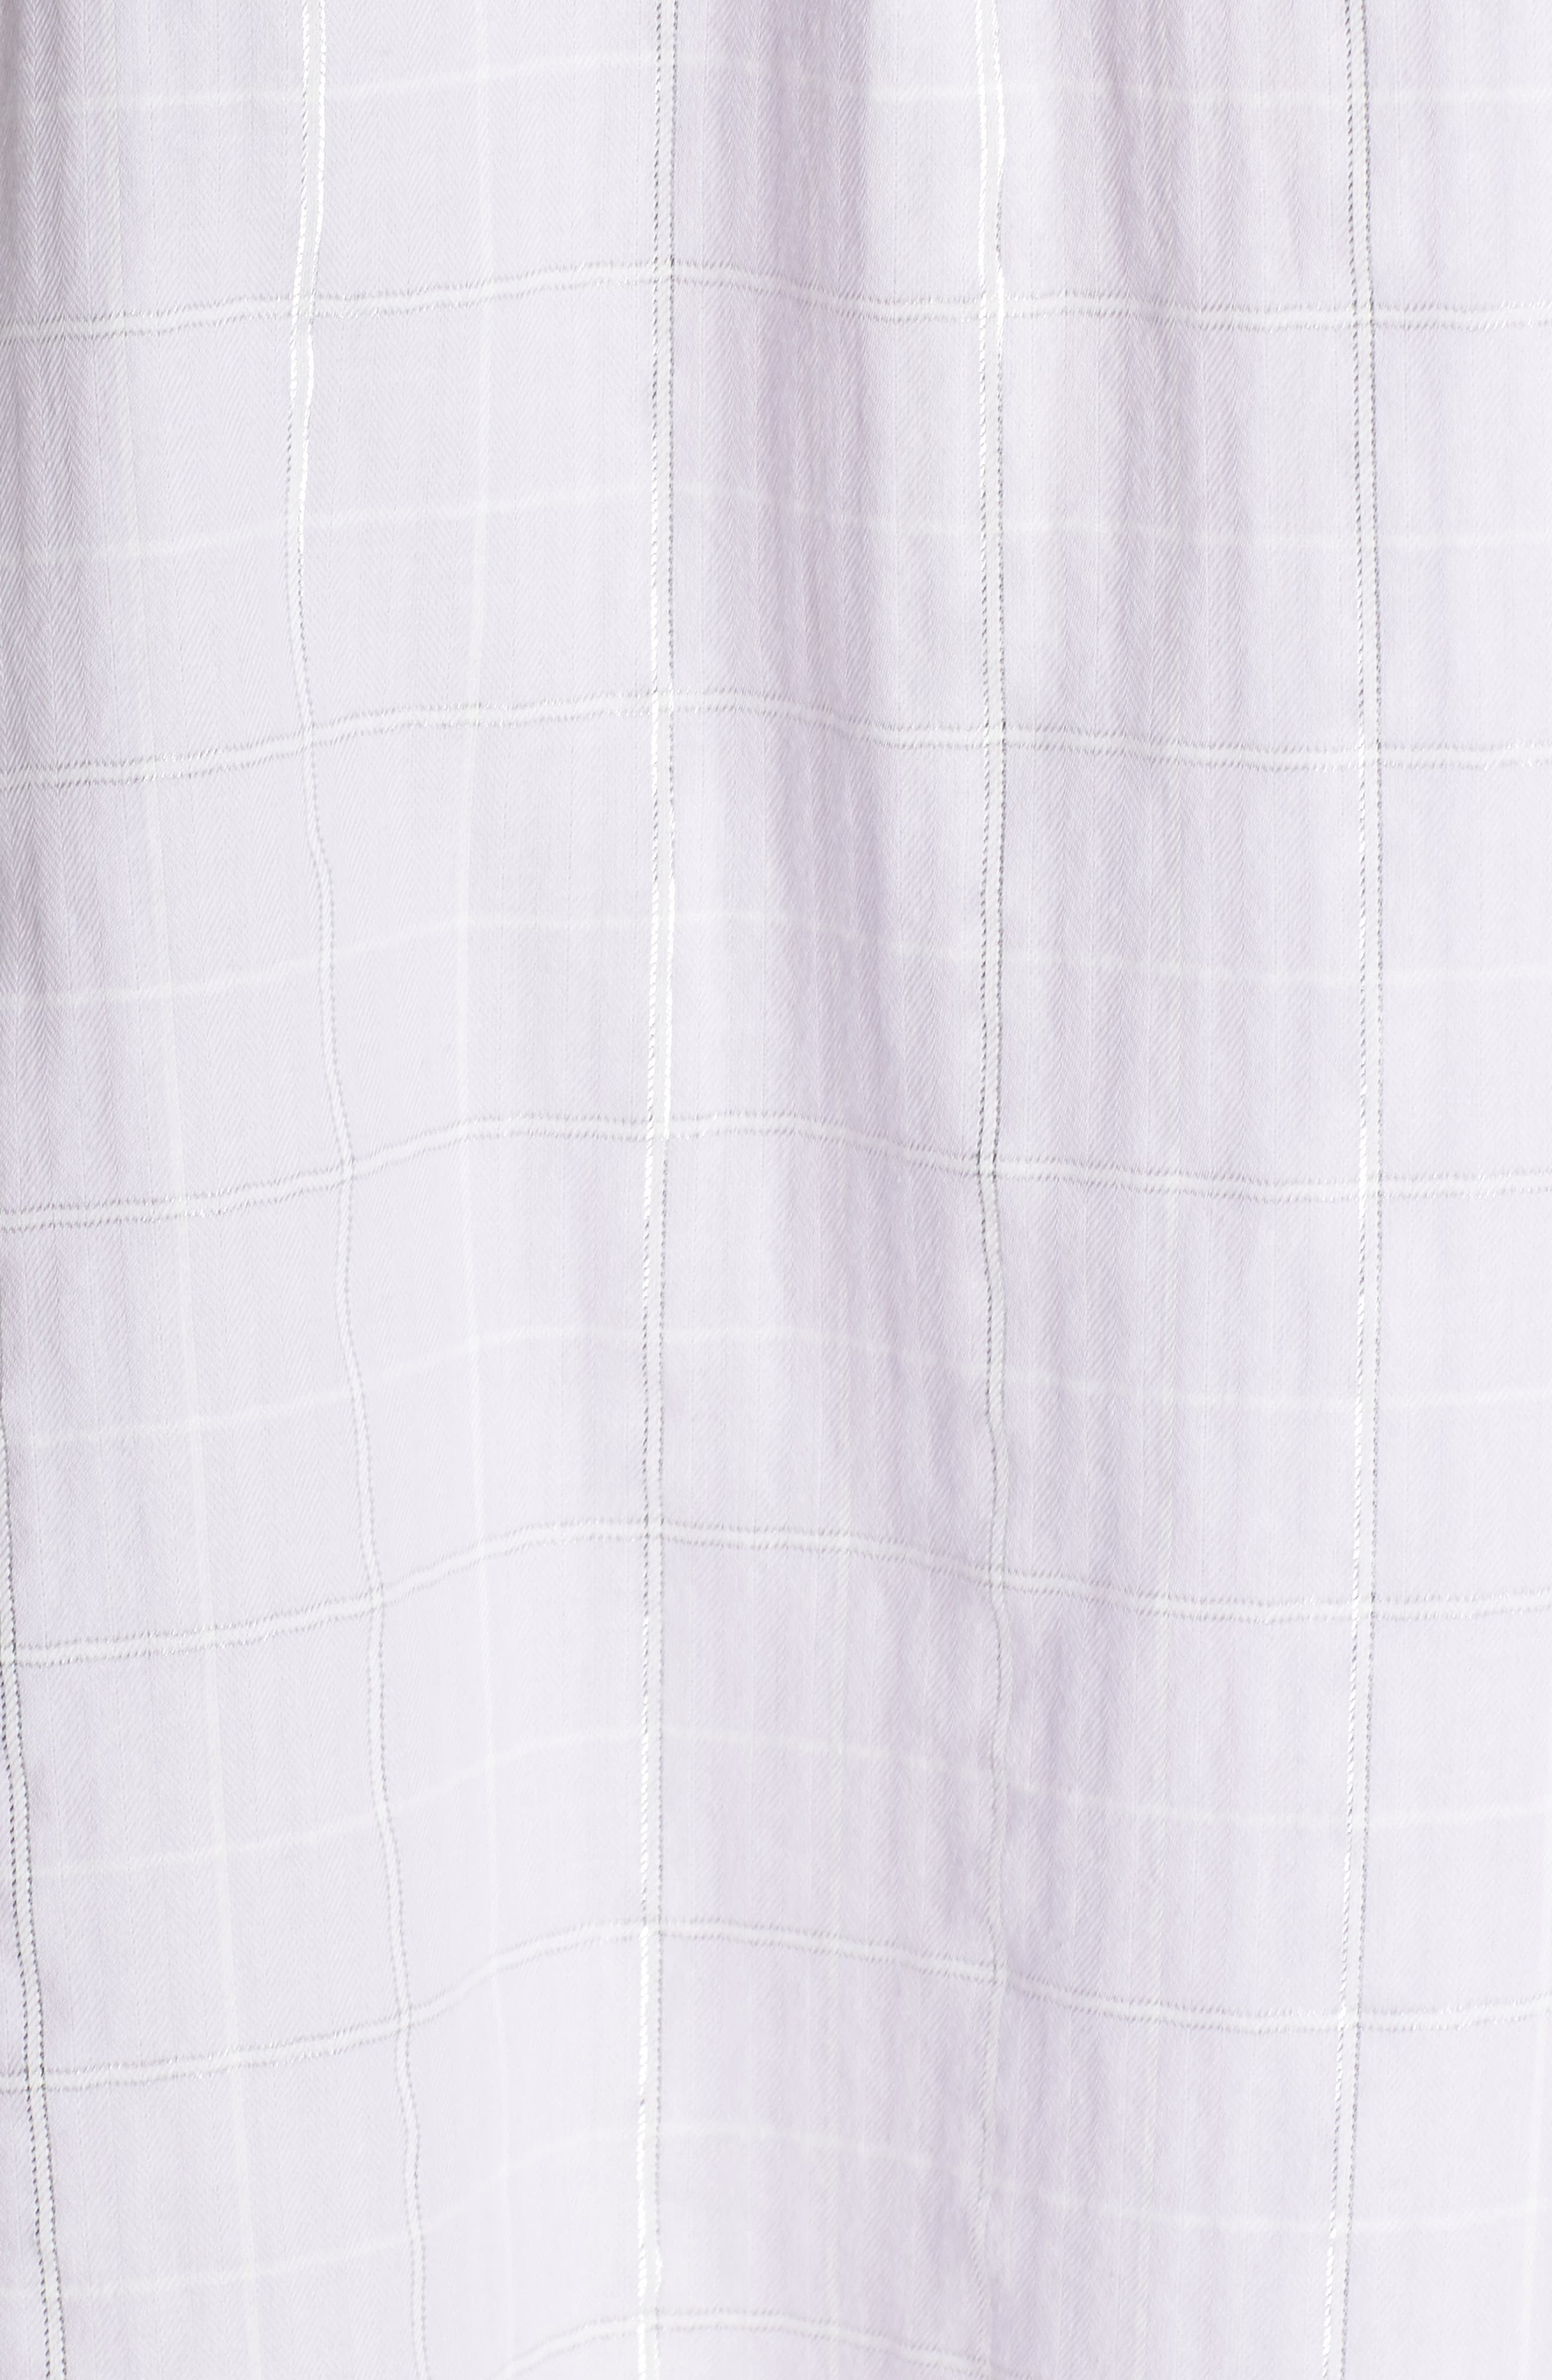 Gabri Sleep Shirt,                             Alternate thumbnail 6, color,                             Lavender Fog